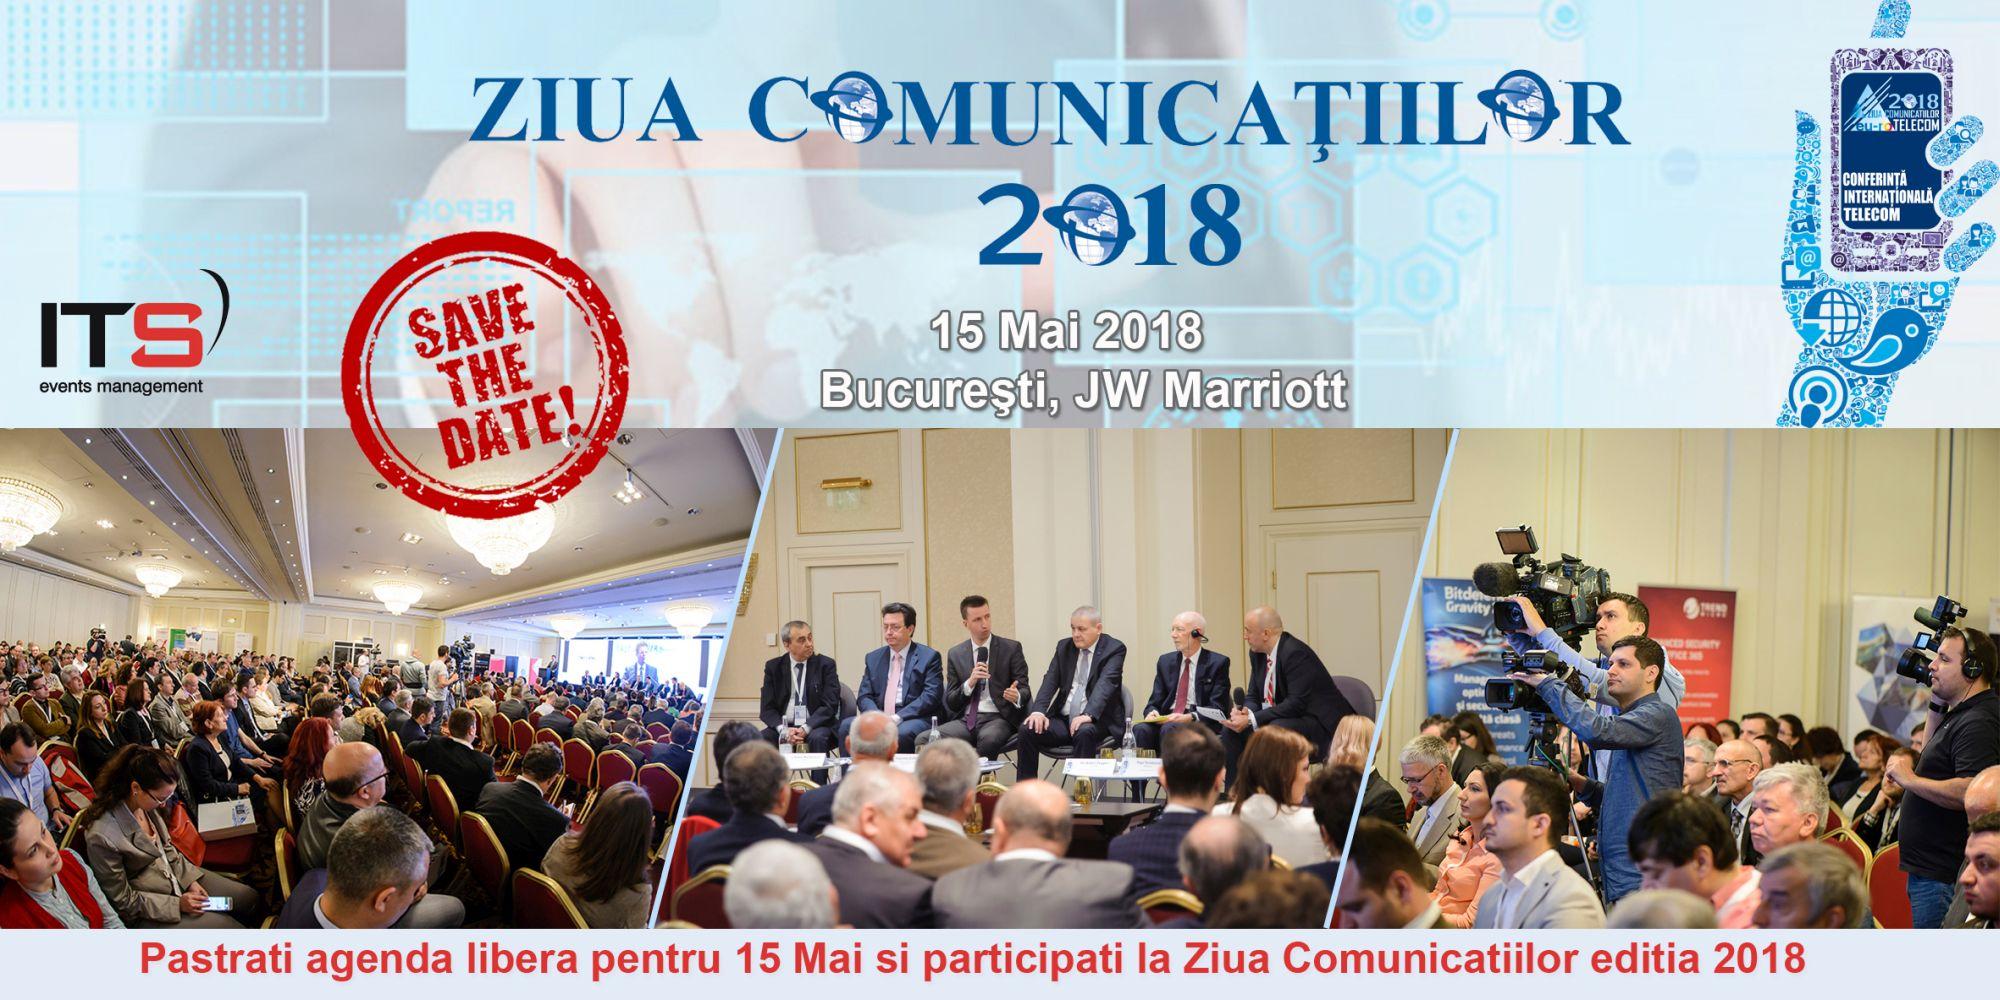 Ziua Comunicatiilor 2018